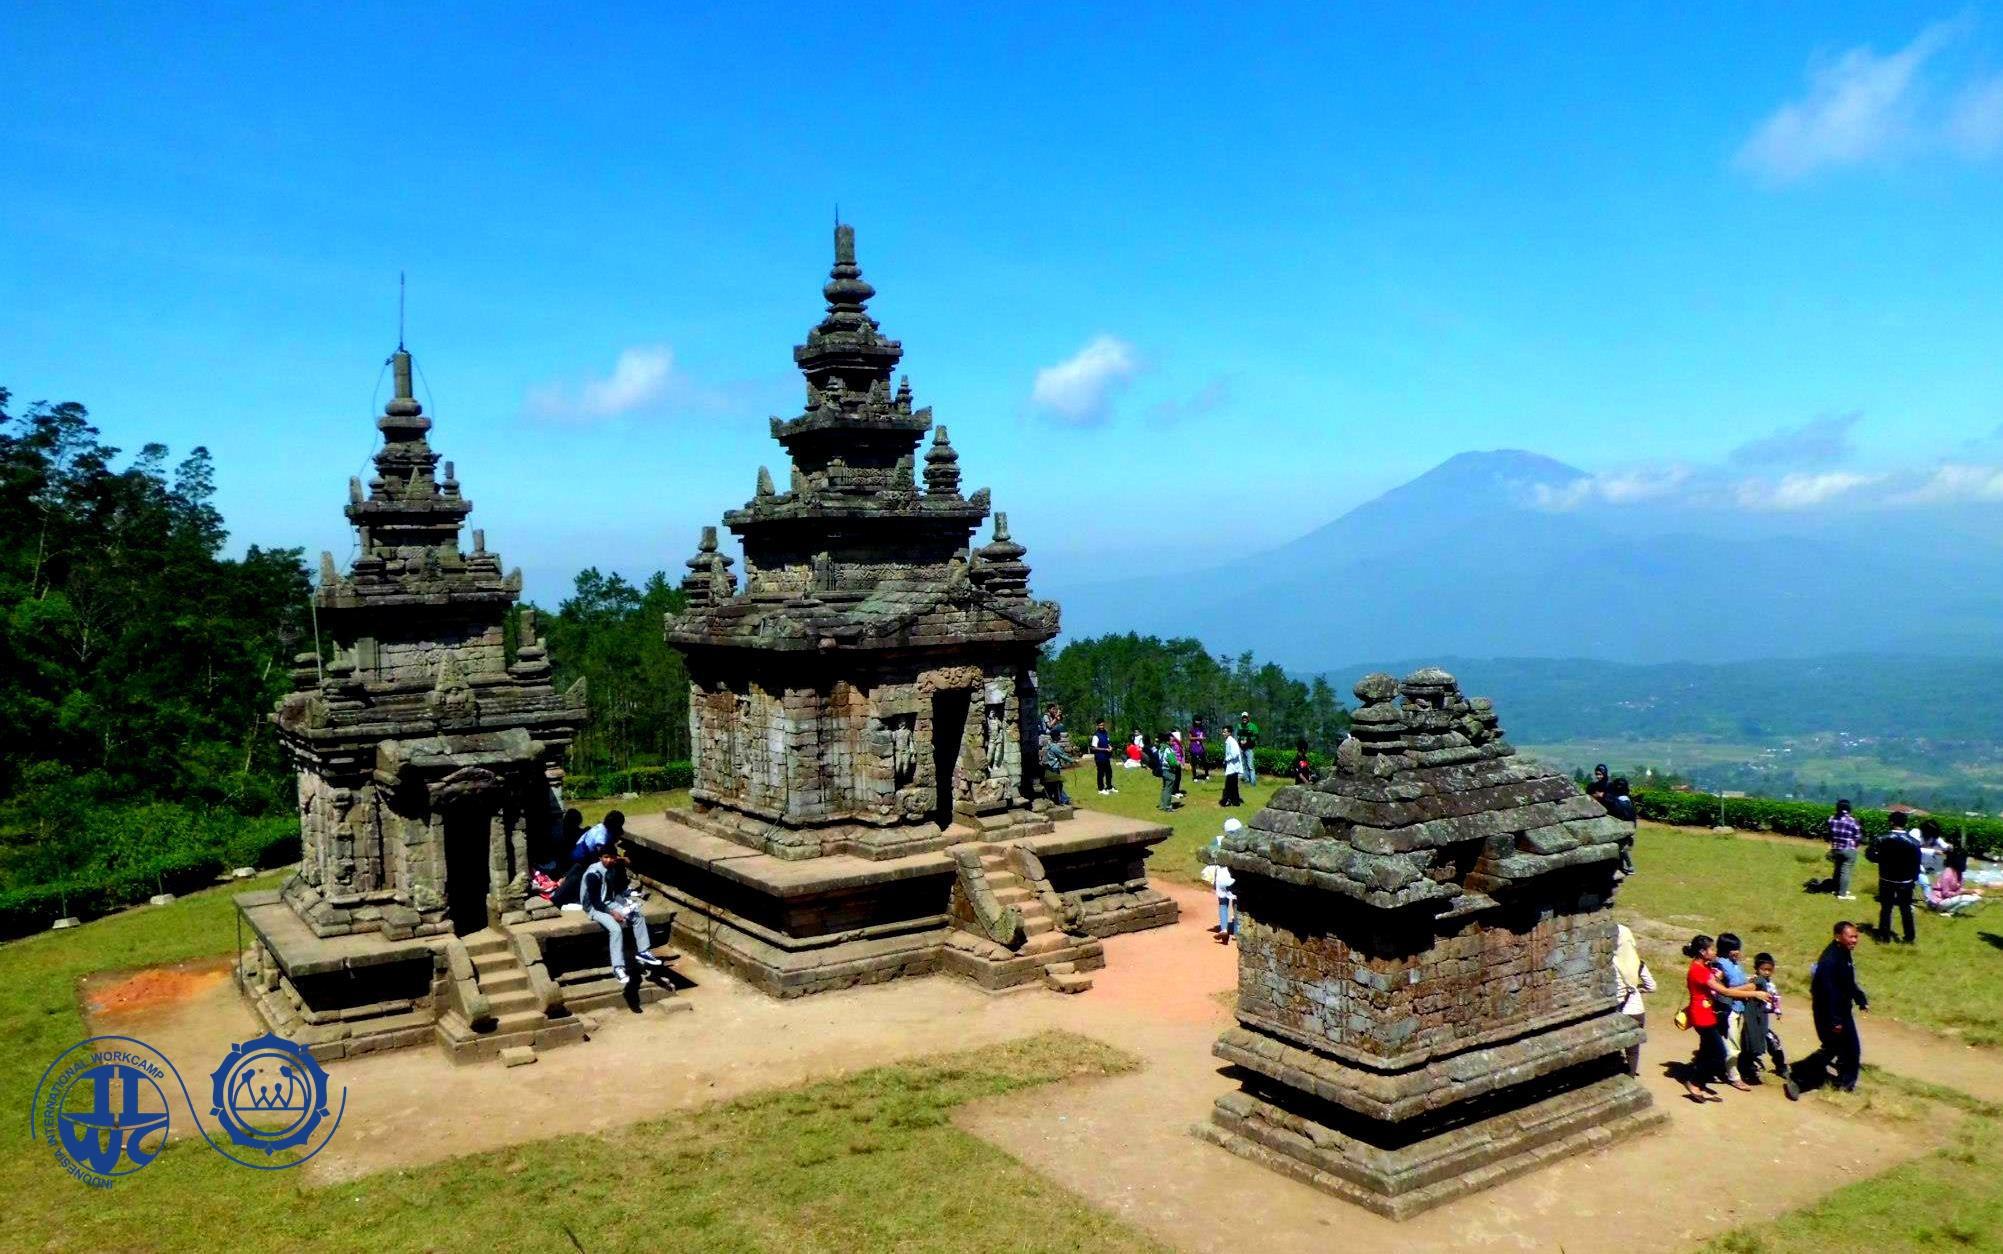 Gedongsongo Camp Iiwc Pkbi Wisata Alam Semarang Candi Gedong Songo